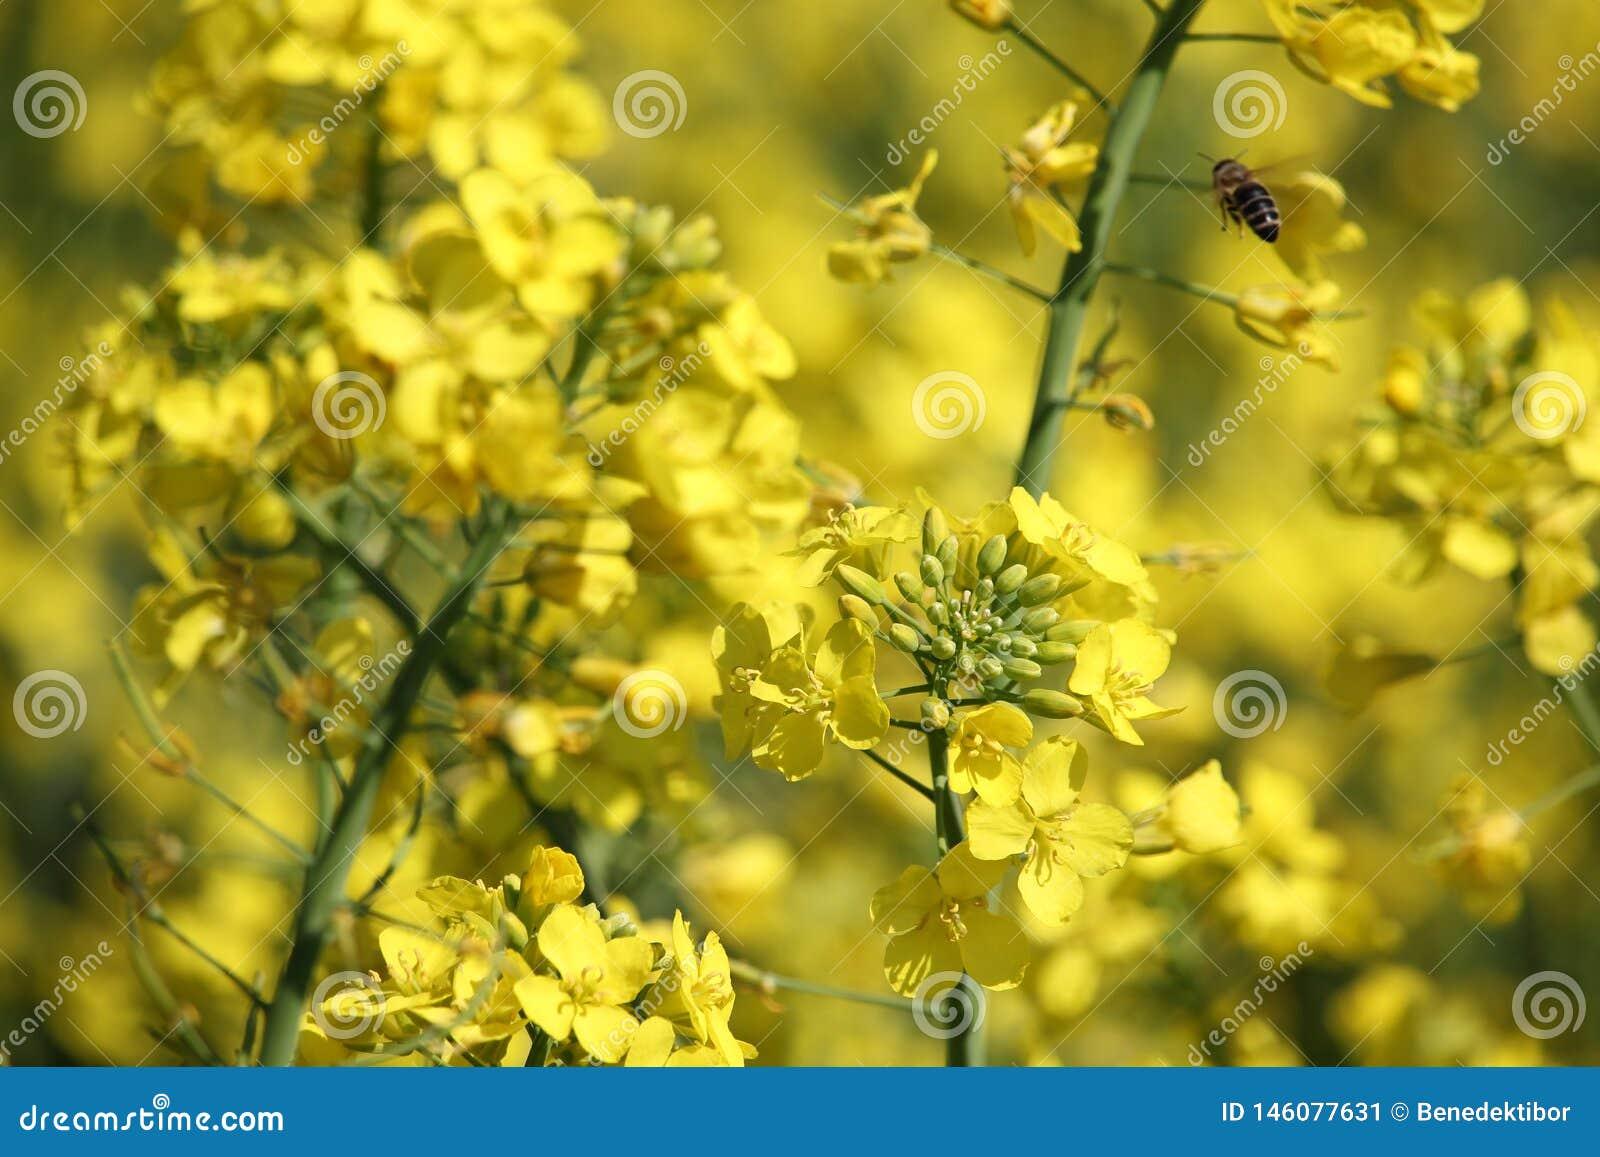 Yellow rape flowers with flying bee closeup